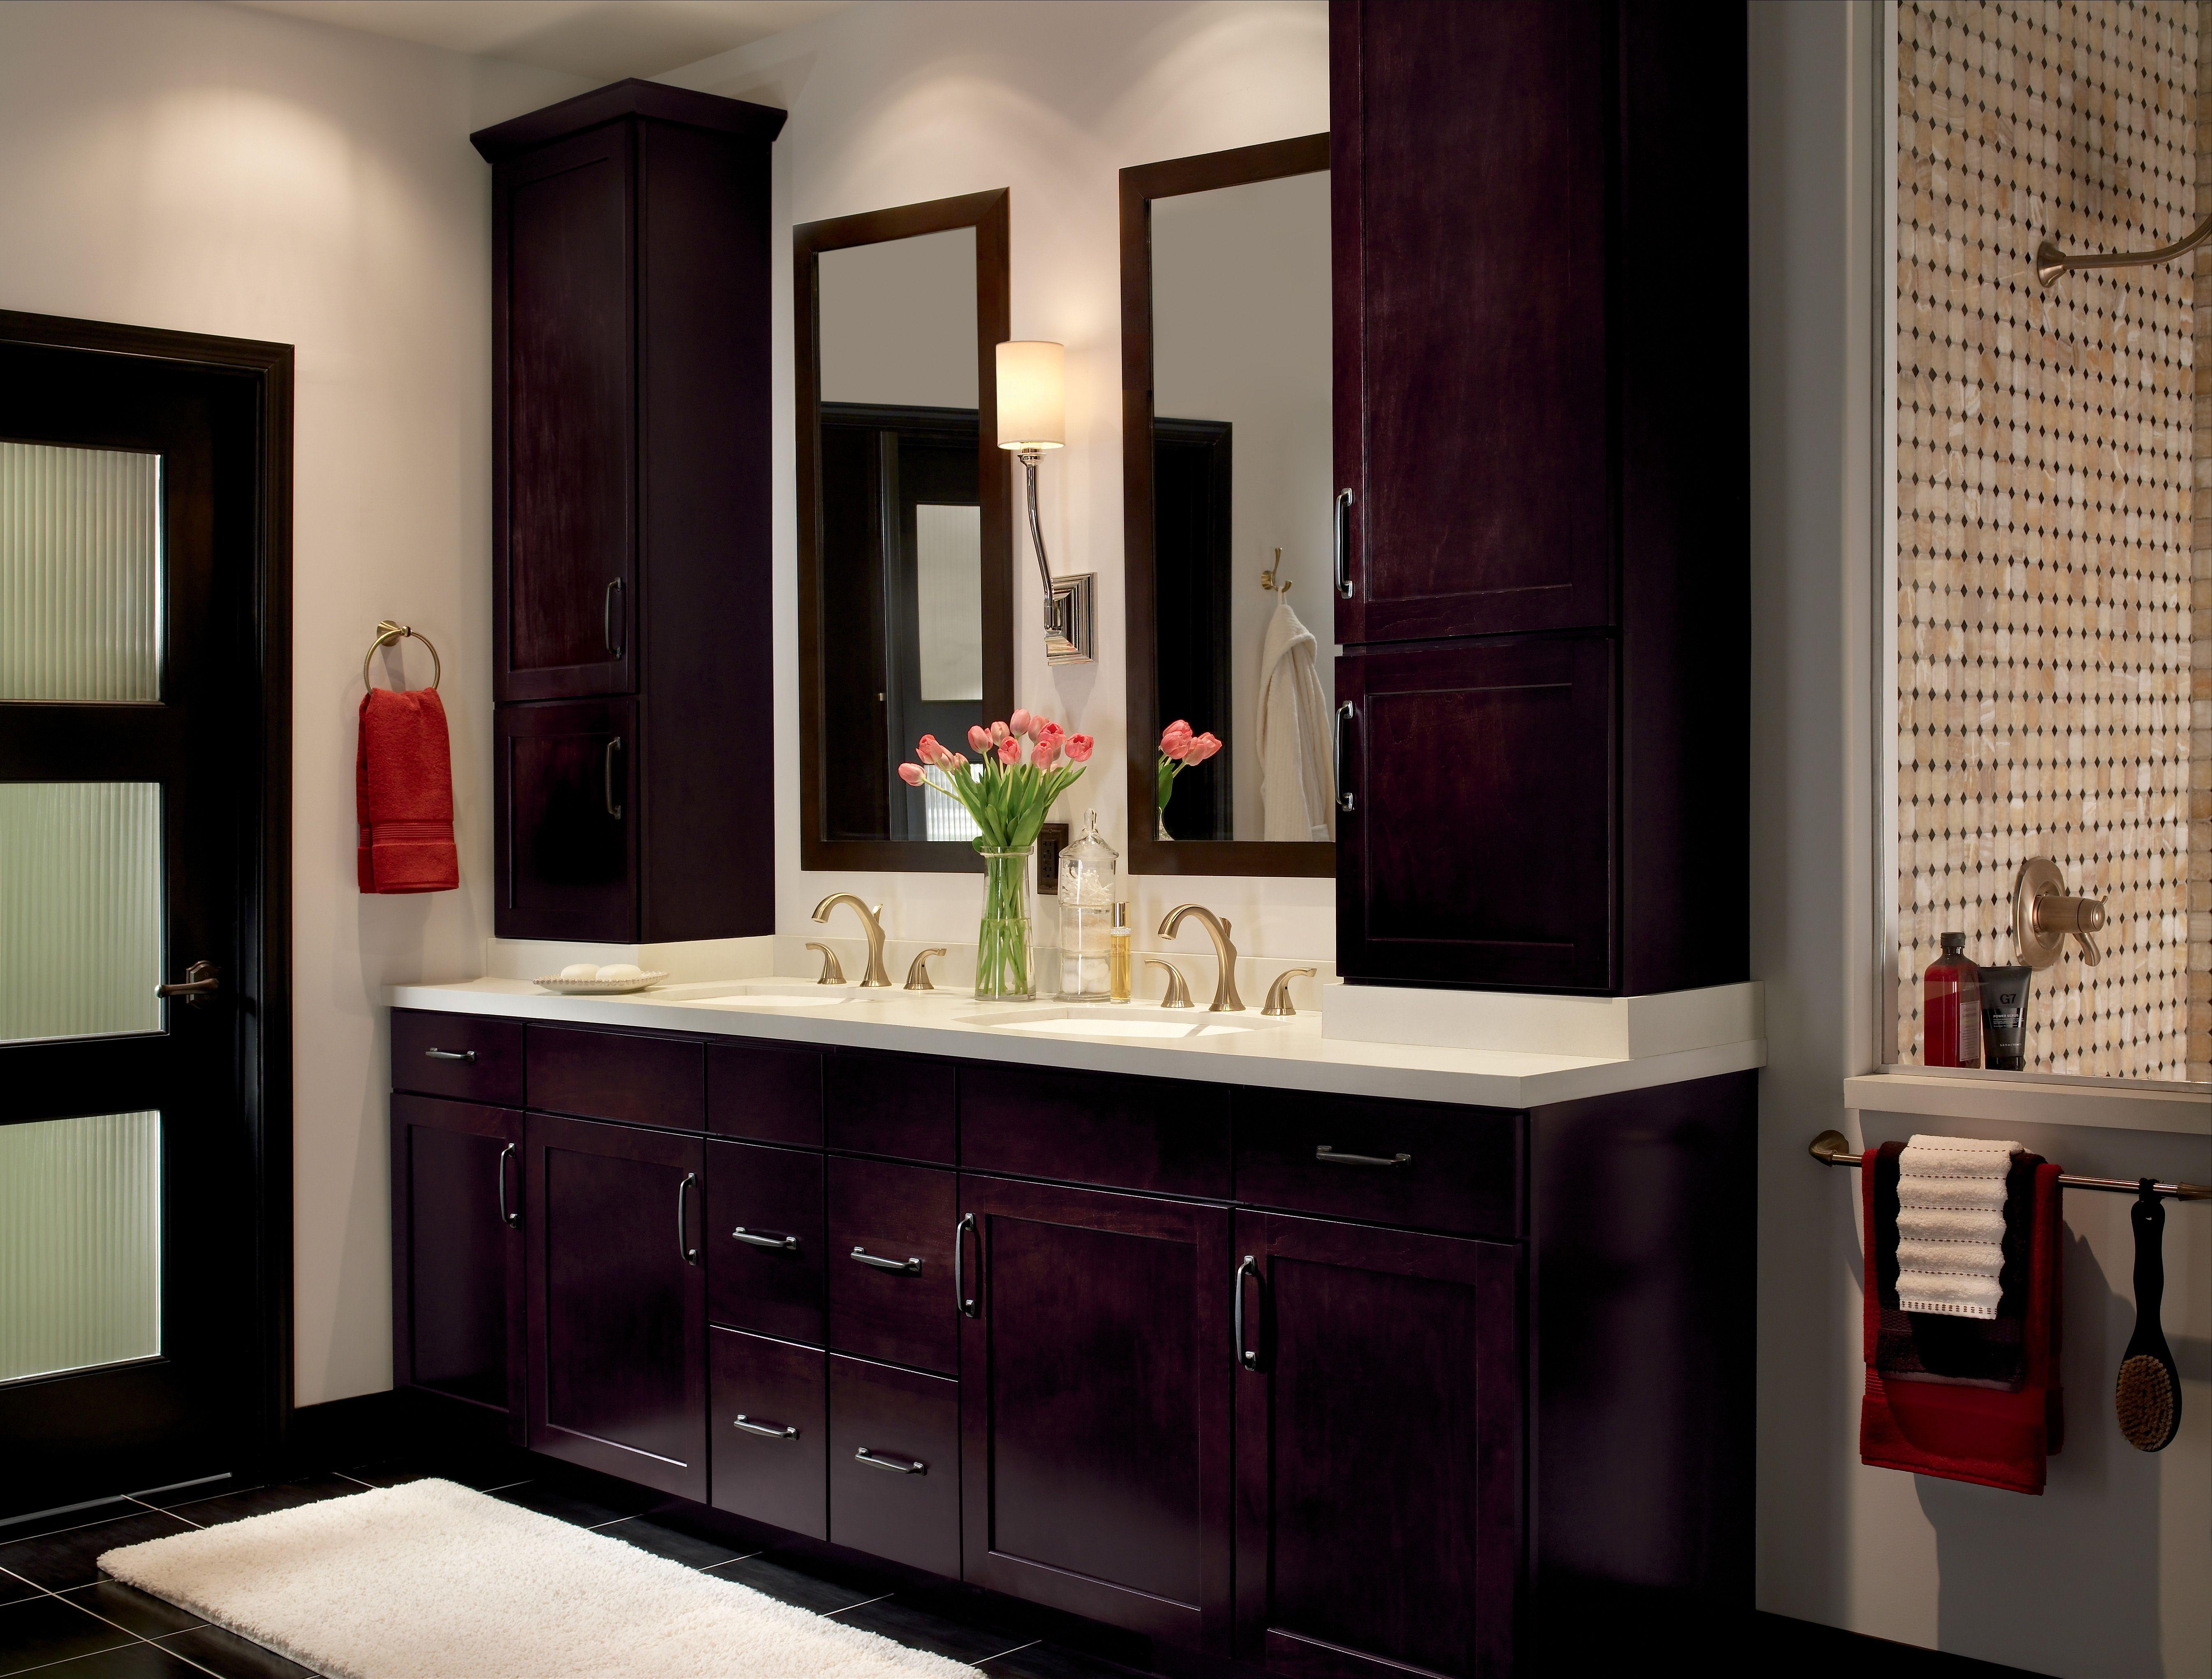 Waypoint Vanity- 410 Door - Maple Espresso | Bathroom ... on Bathroom Ideas With Maple Cabinets  id=28698